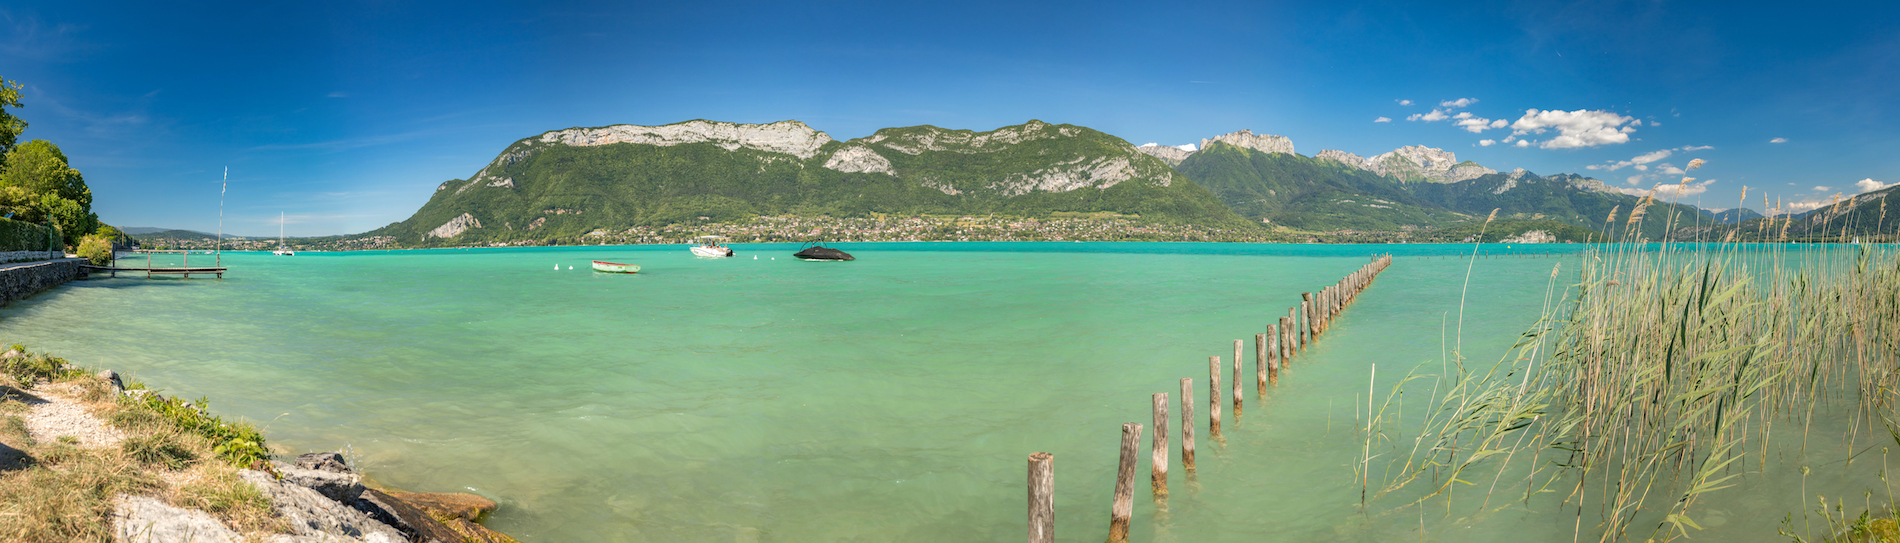 Pano lac Sevrier ©Séverine Brussoz